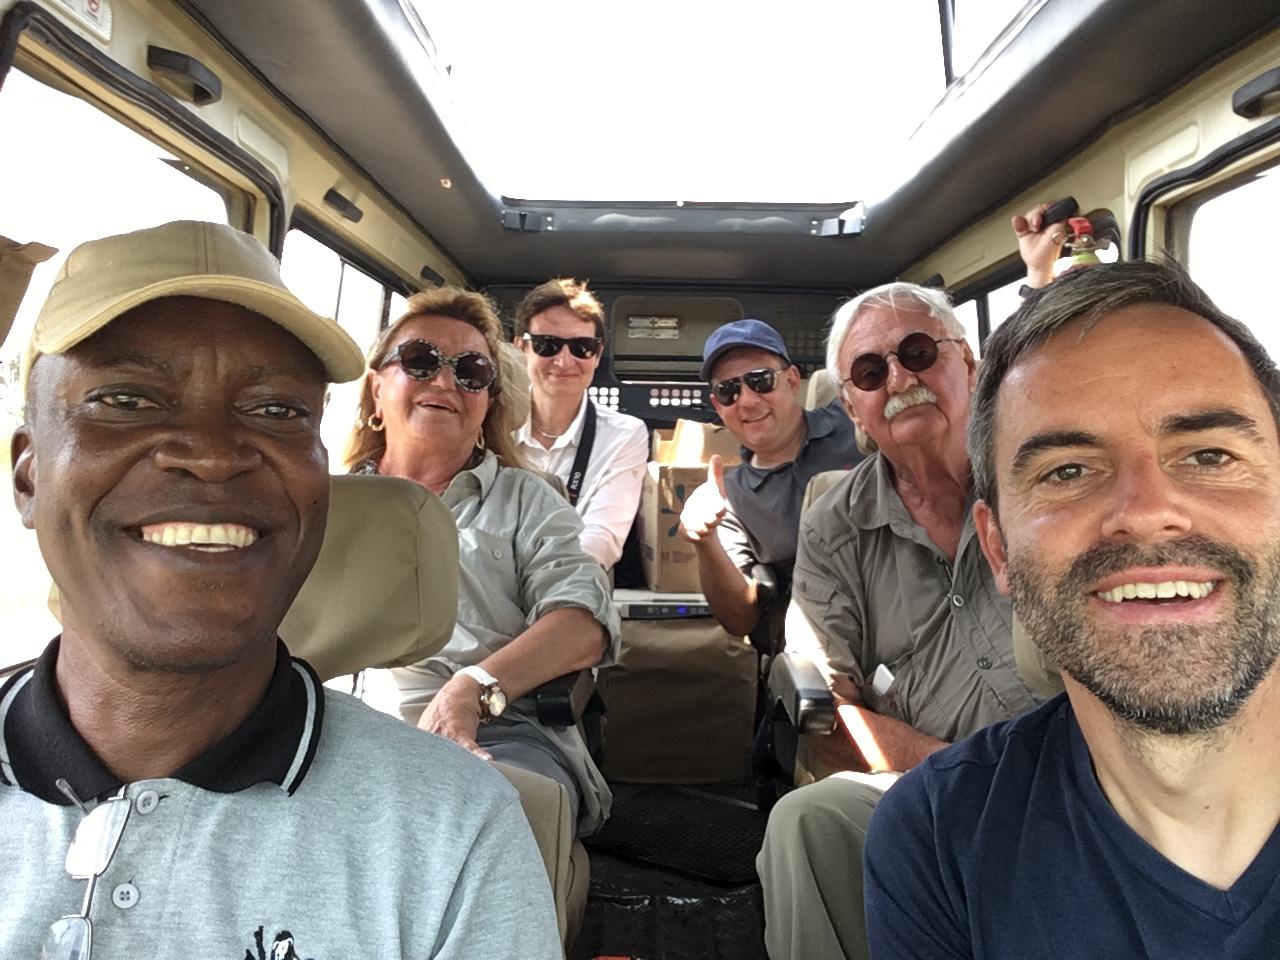 Gorilla Trekking in Uganda   unser Besuch bei den sanften Riesen uganda sonne safari reisebericht new afrika  tui berlin uganda gorillatrekking reisegruppe